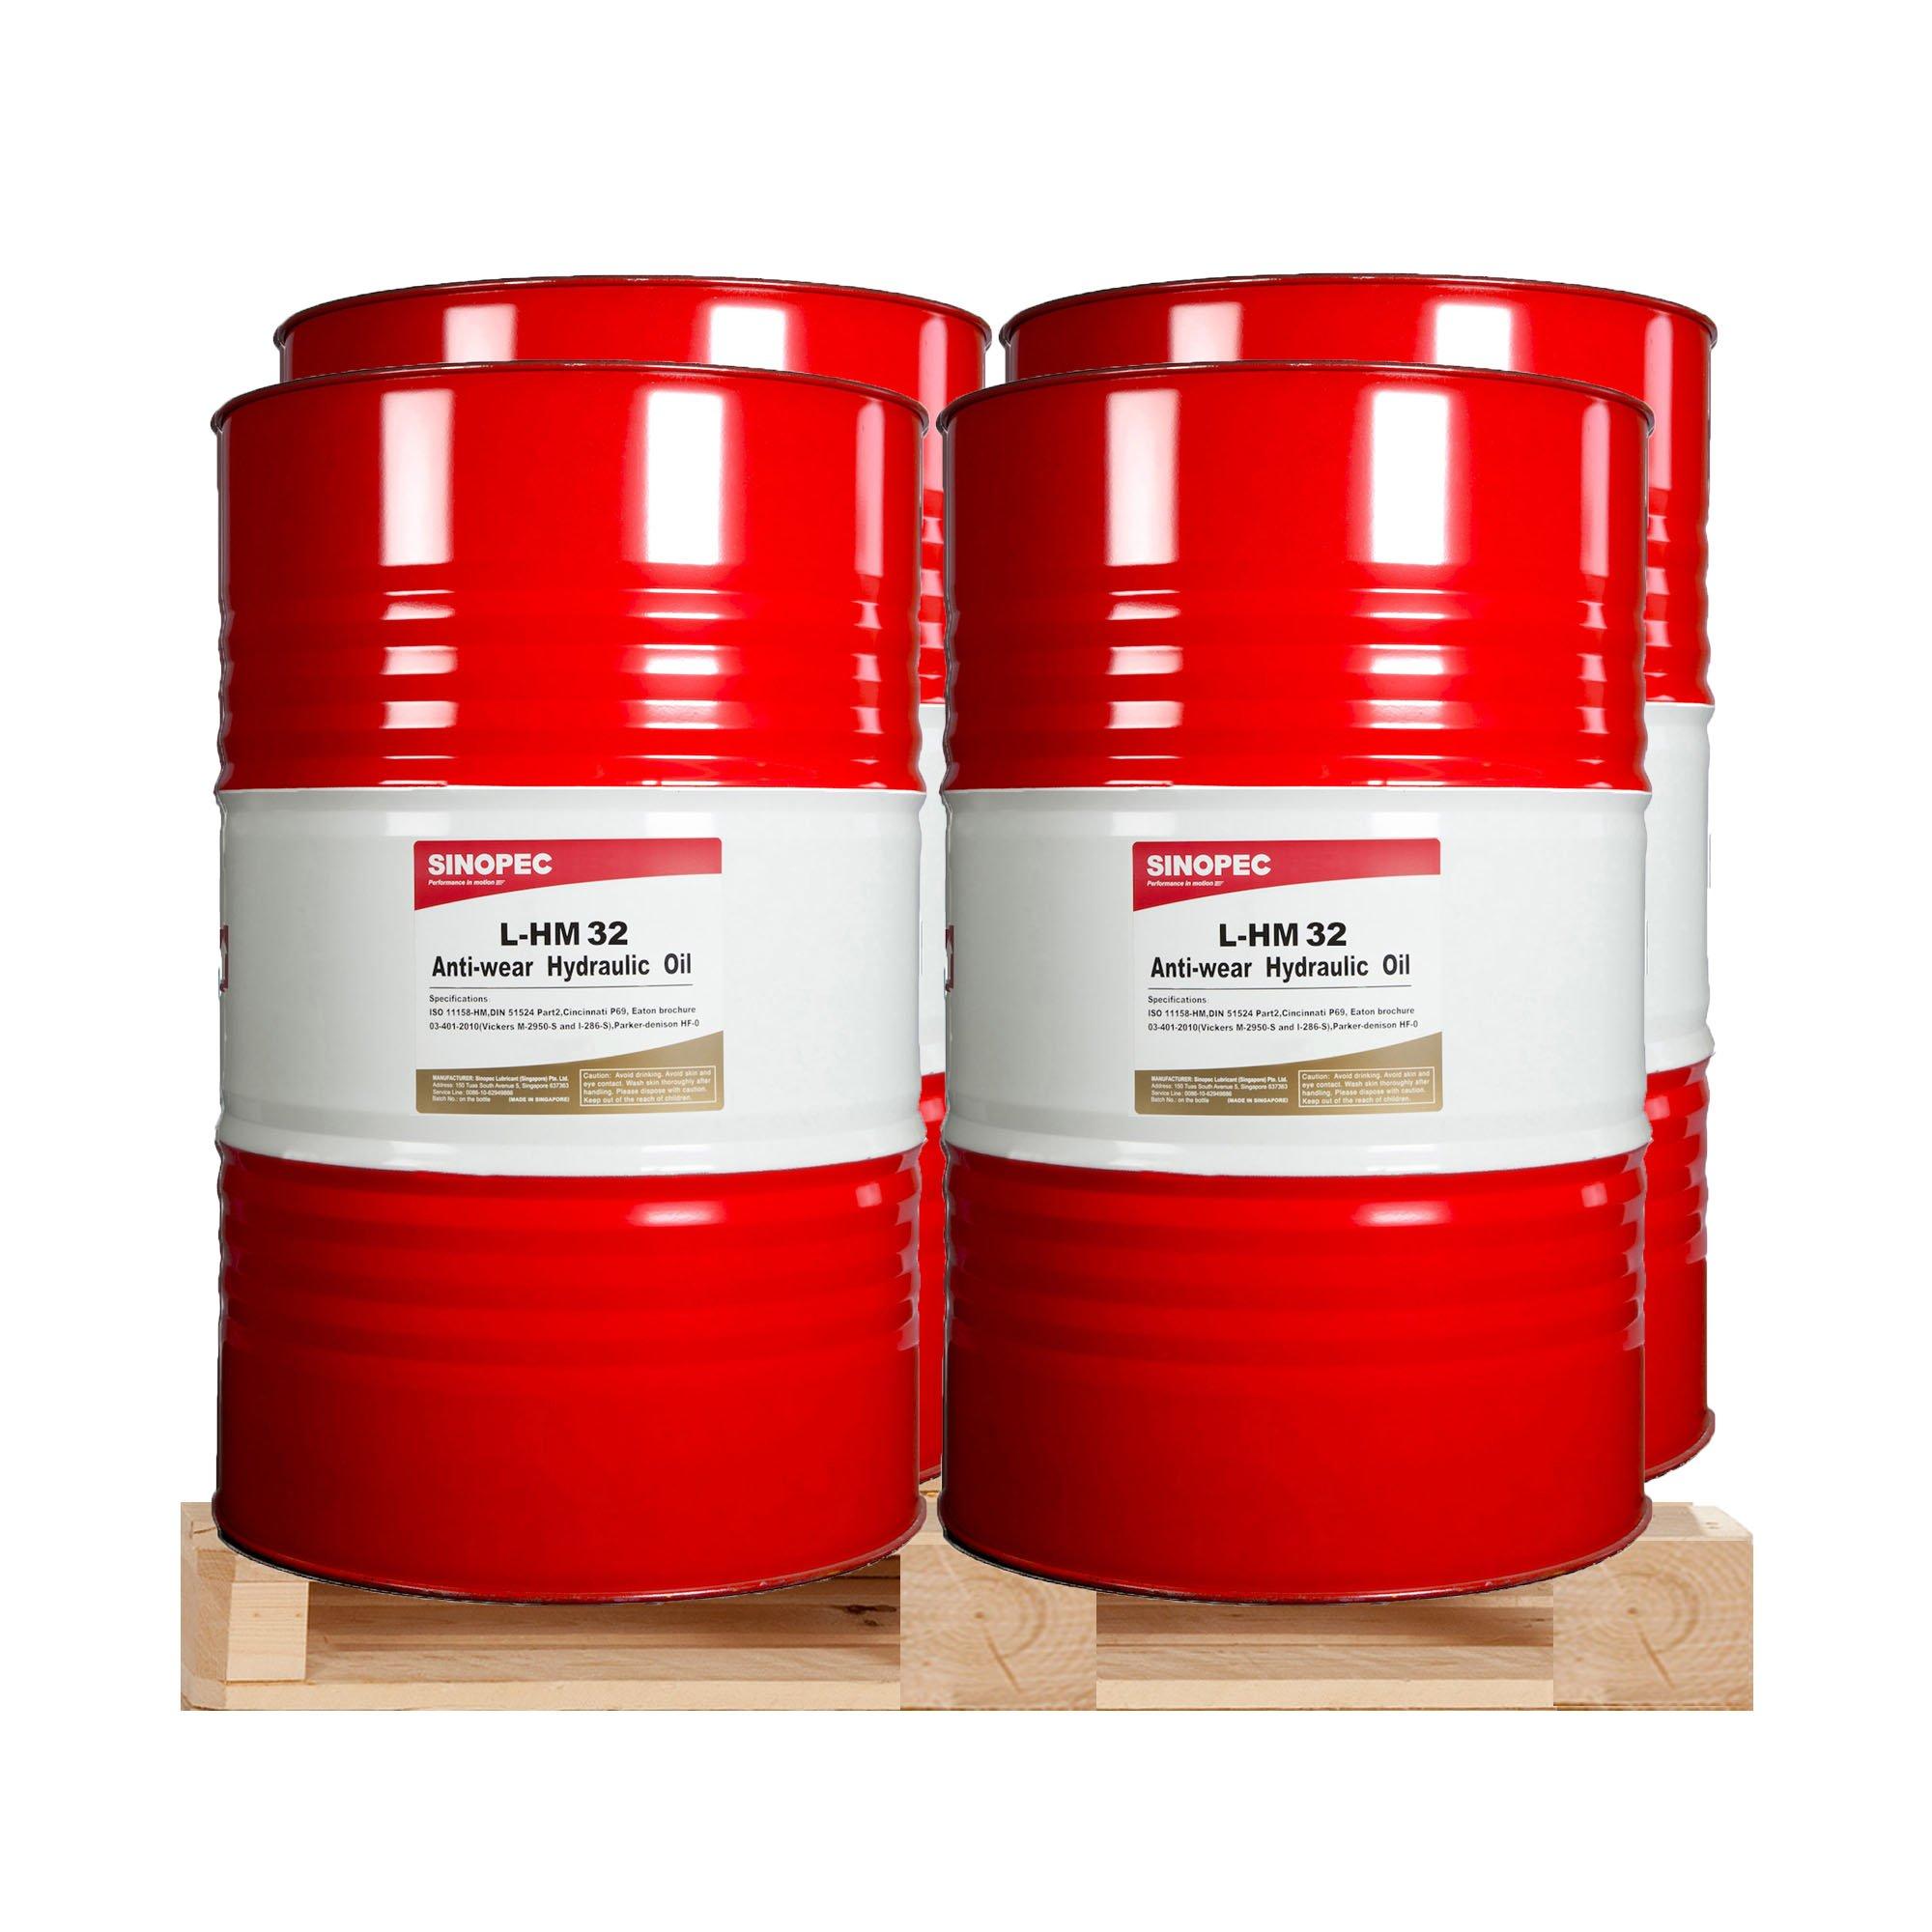 $299 Each - AW 32 Hydraulic Oil - (4) 55 Gallon Drums by Sinopec